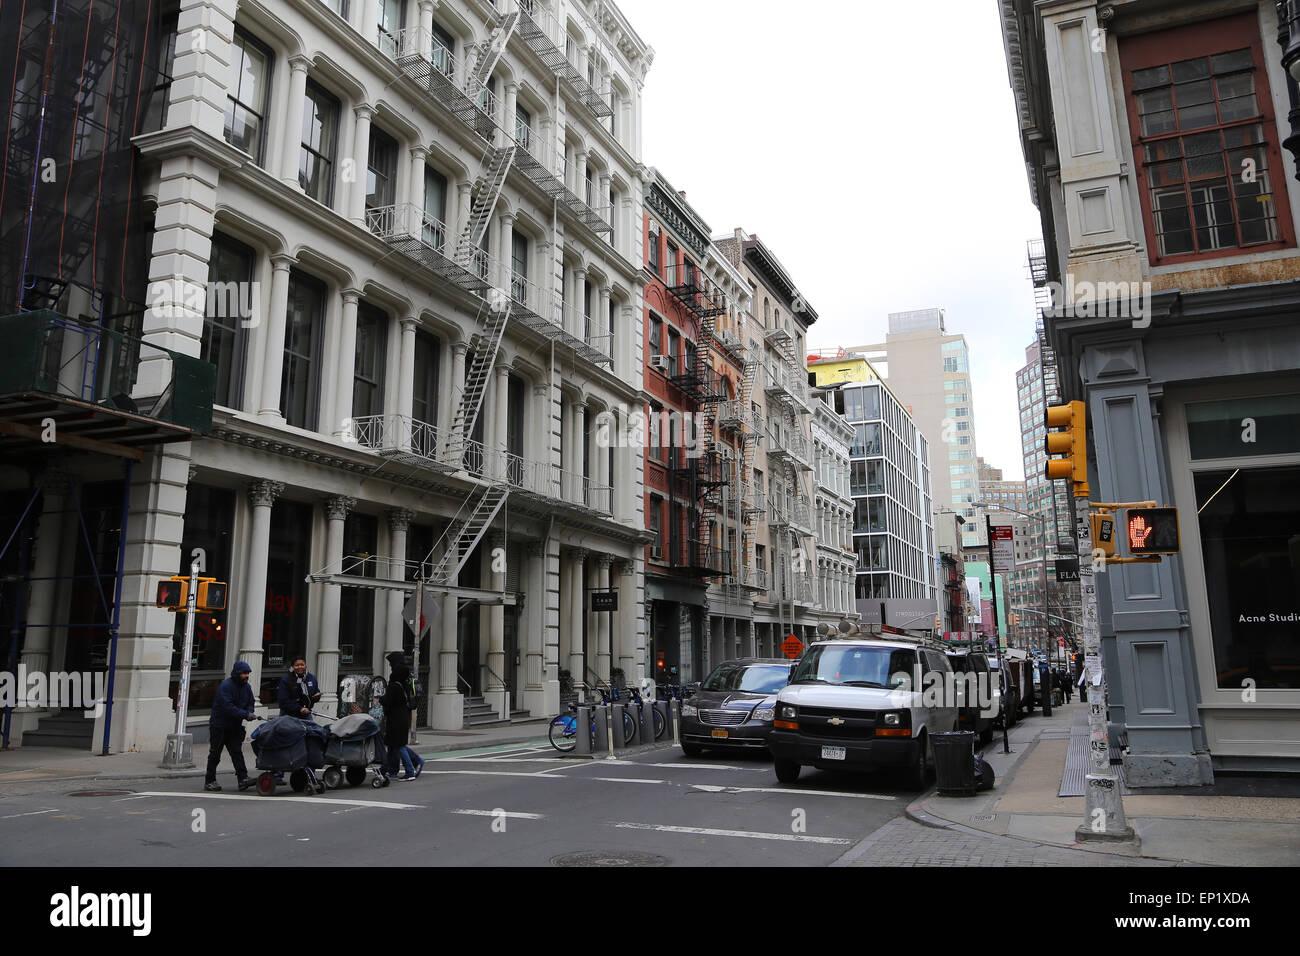 United States. New York City. Lower Manhattan. Soho. - Stock Image